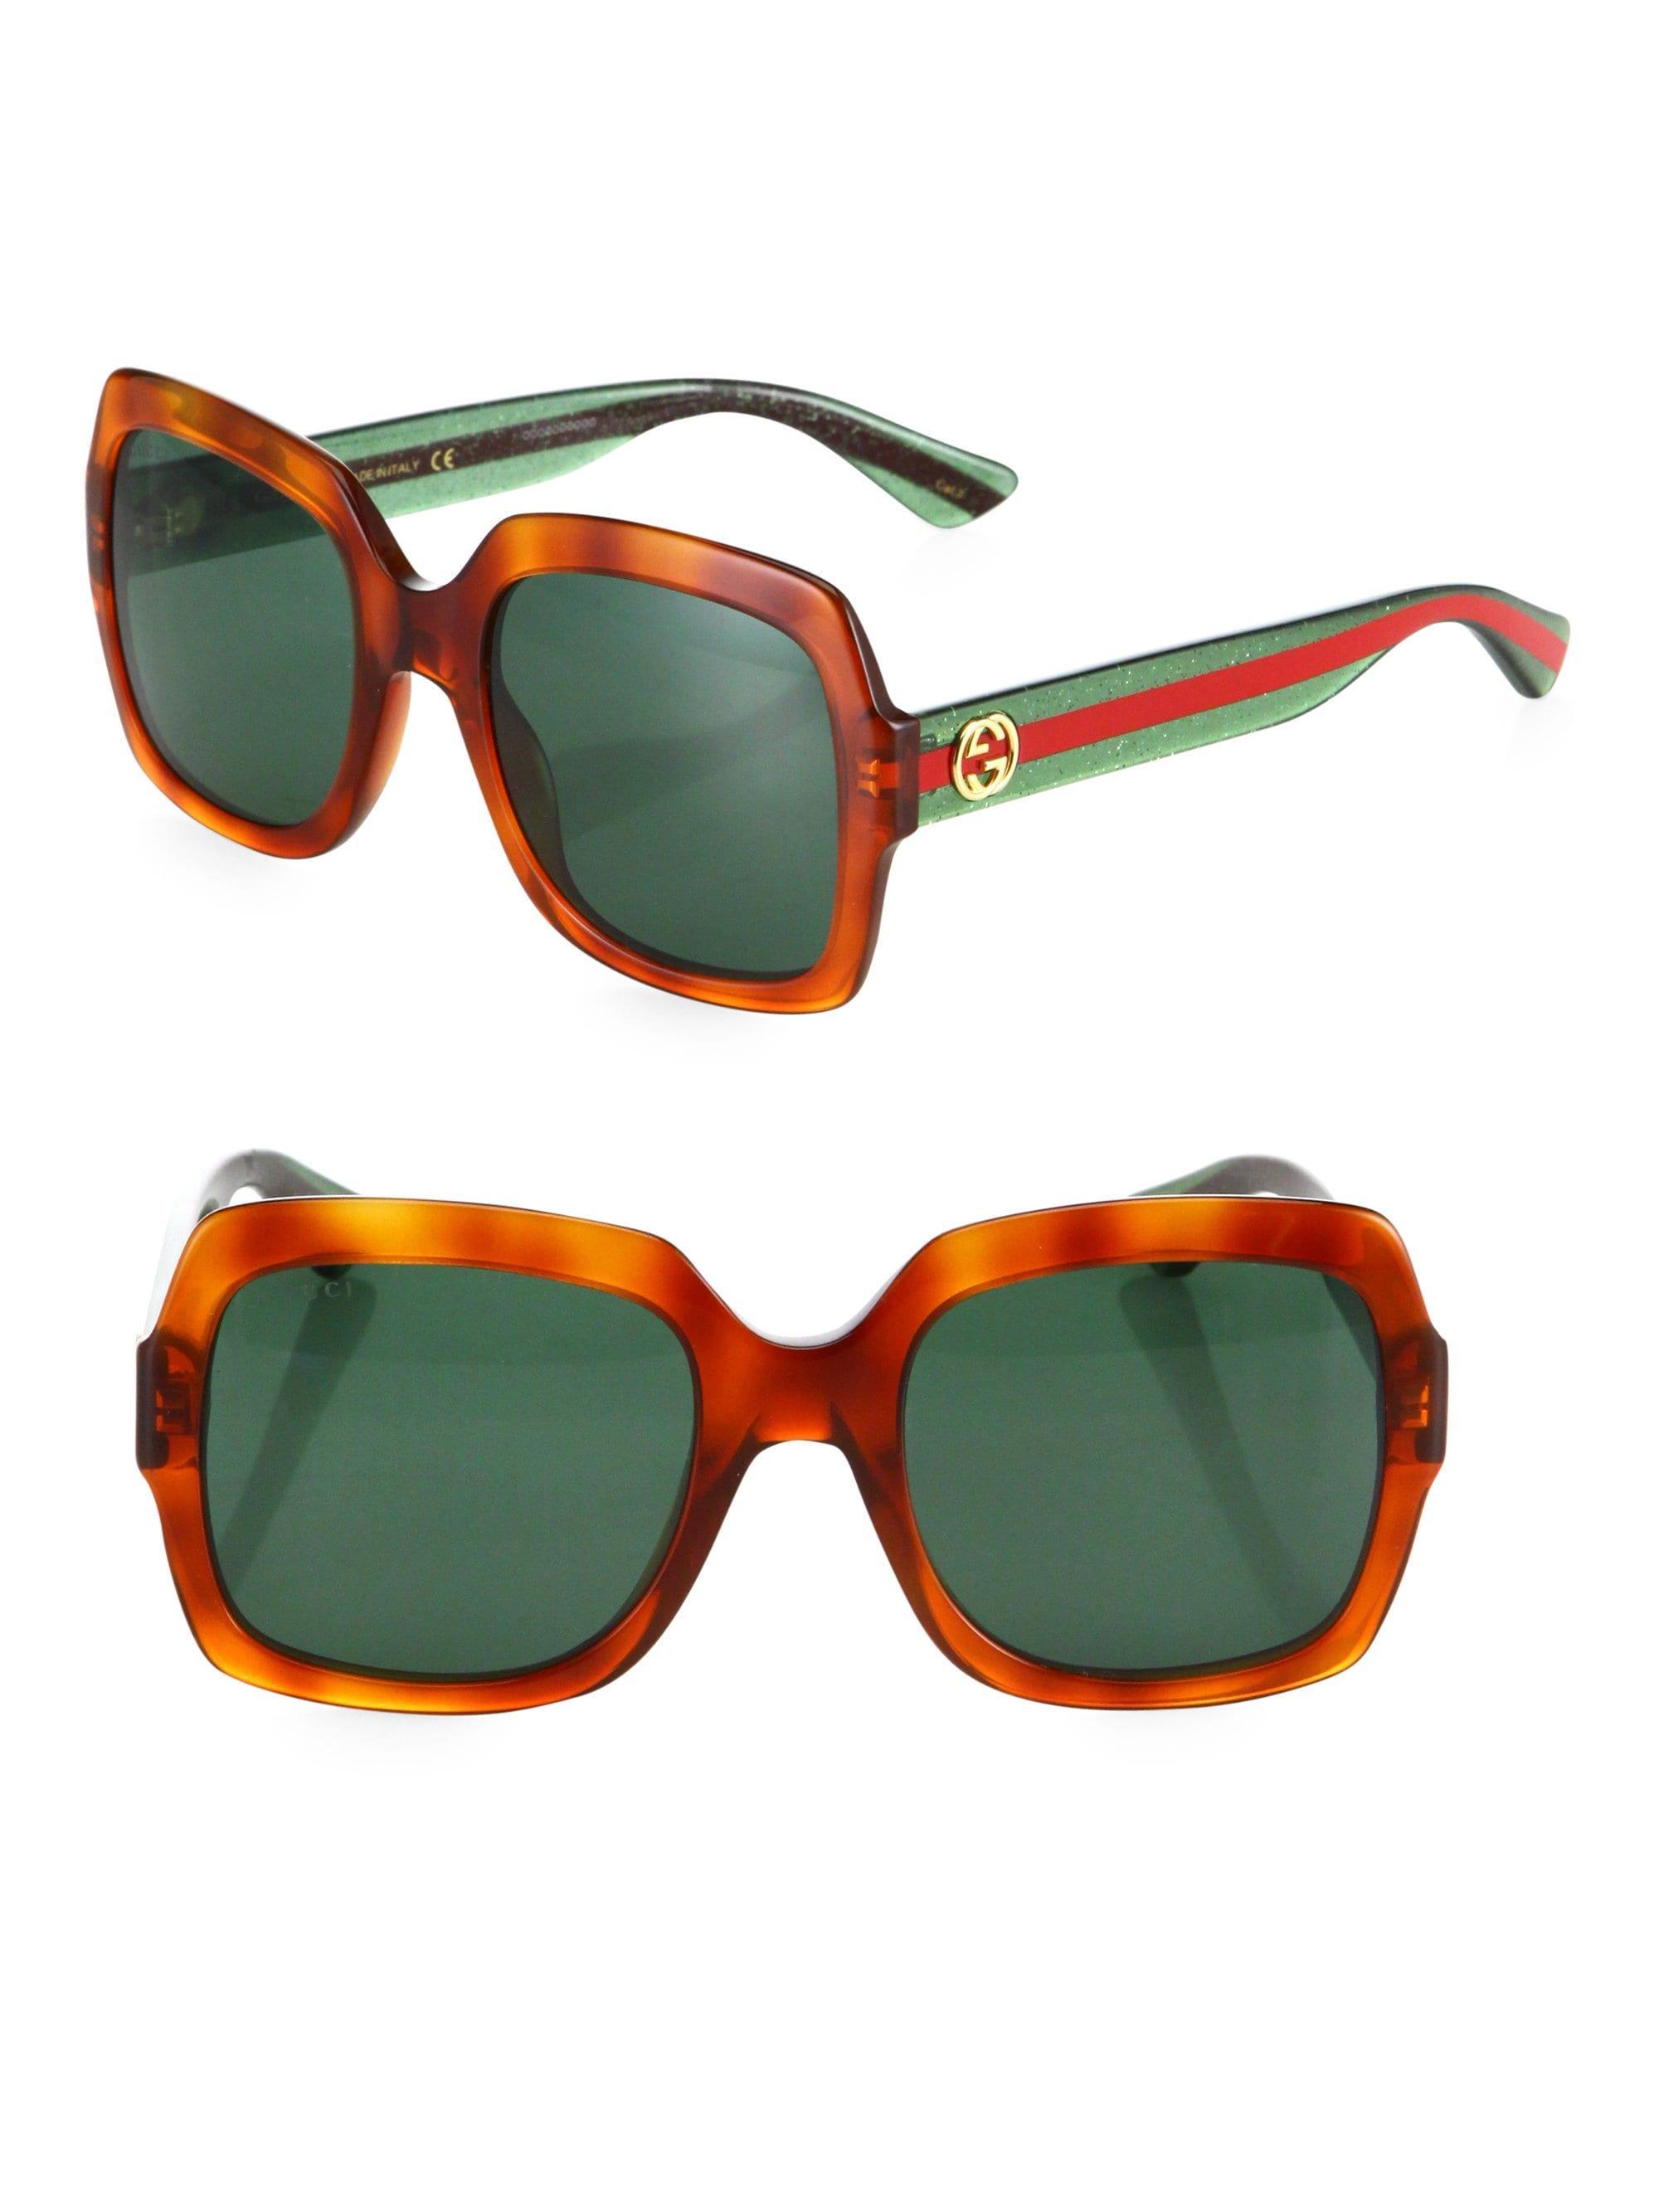 a1f0898110c Lyst - Gucci Women s 54mm Glitter Web Oversized Square Sunglasses ...